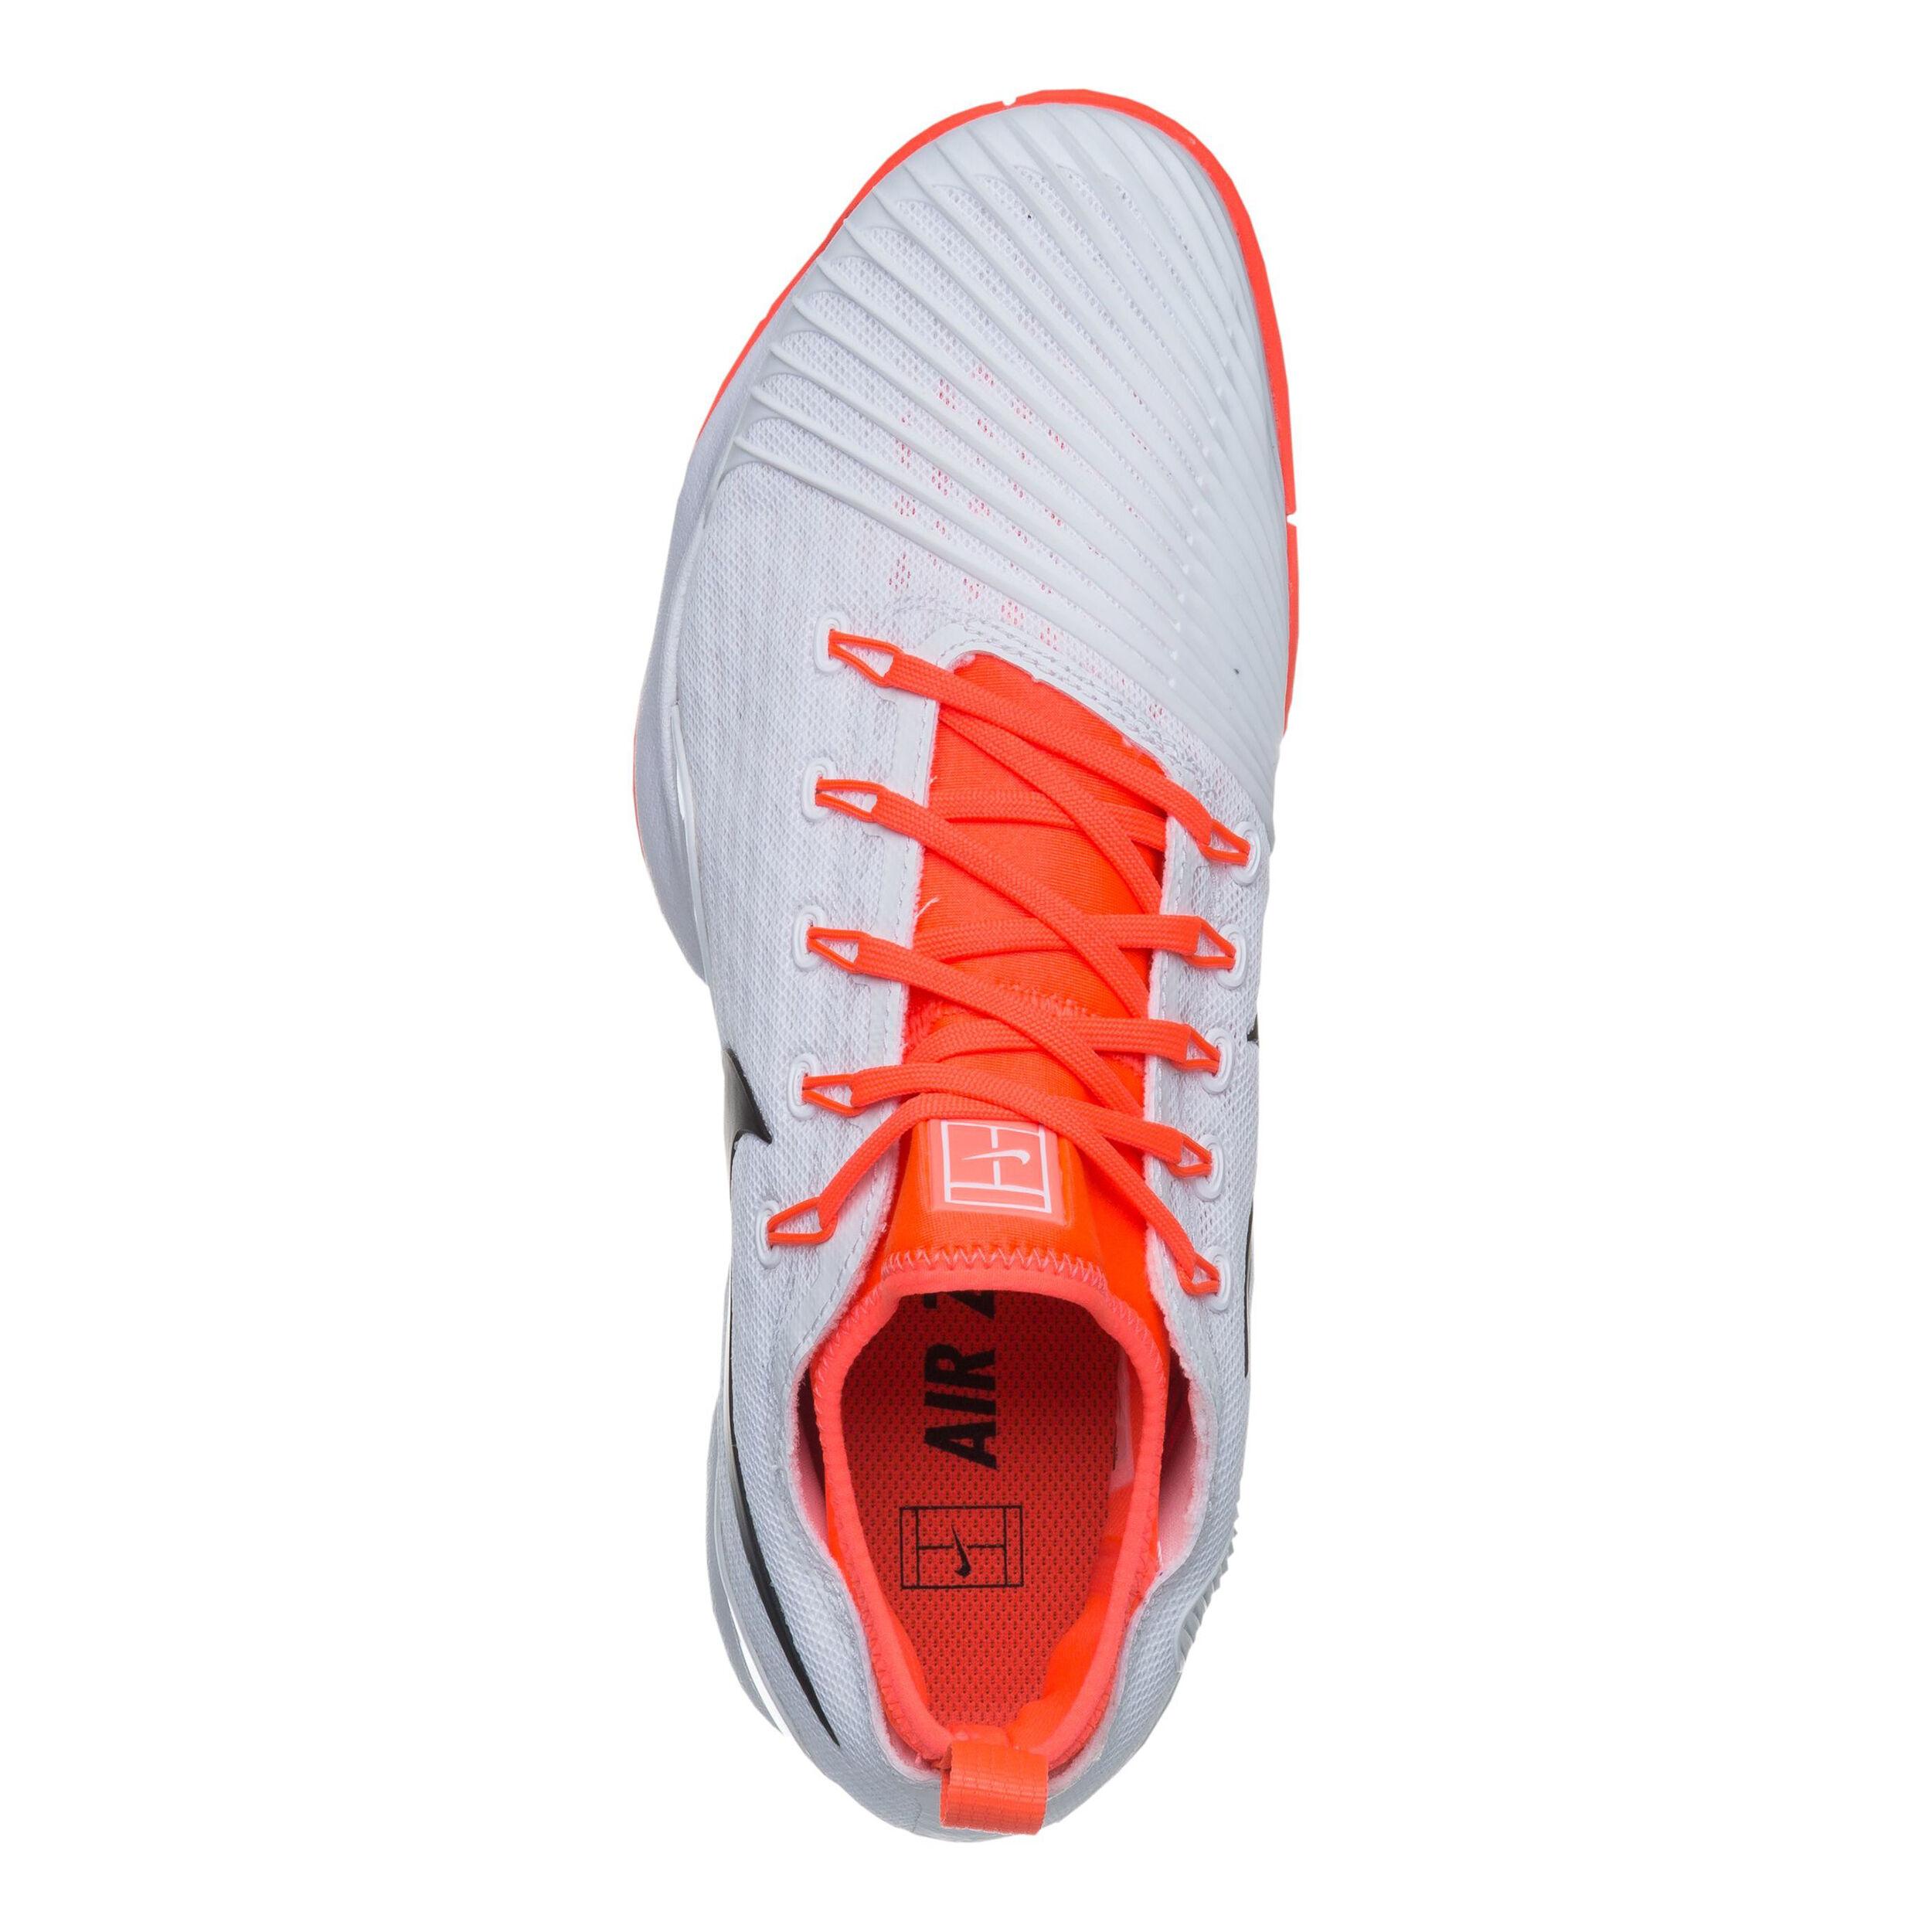 white UK 5 Nike Air Zoom Ultra tennis trainers US 5.5, Eu 38